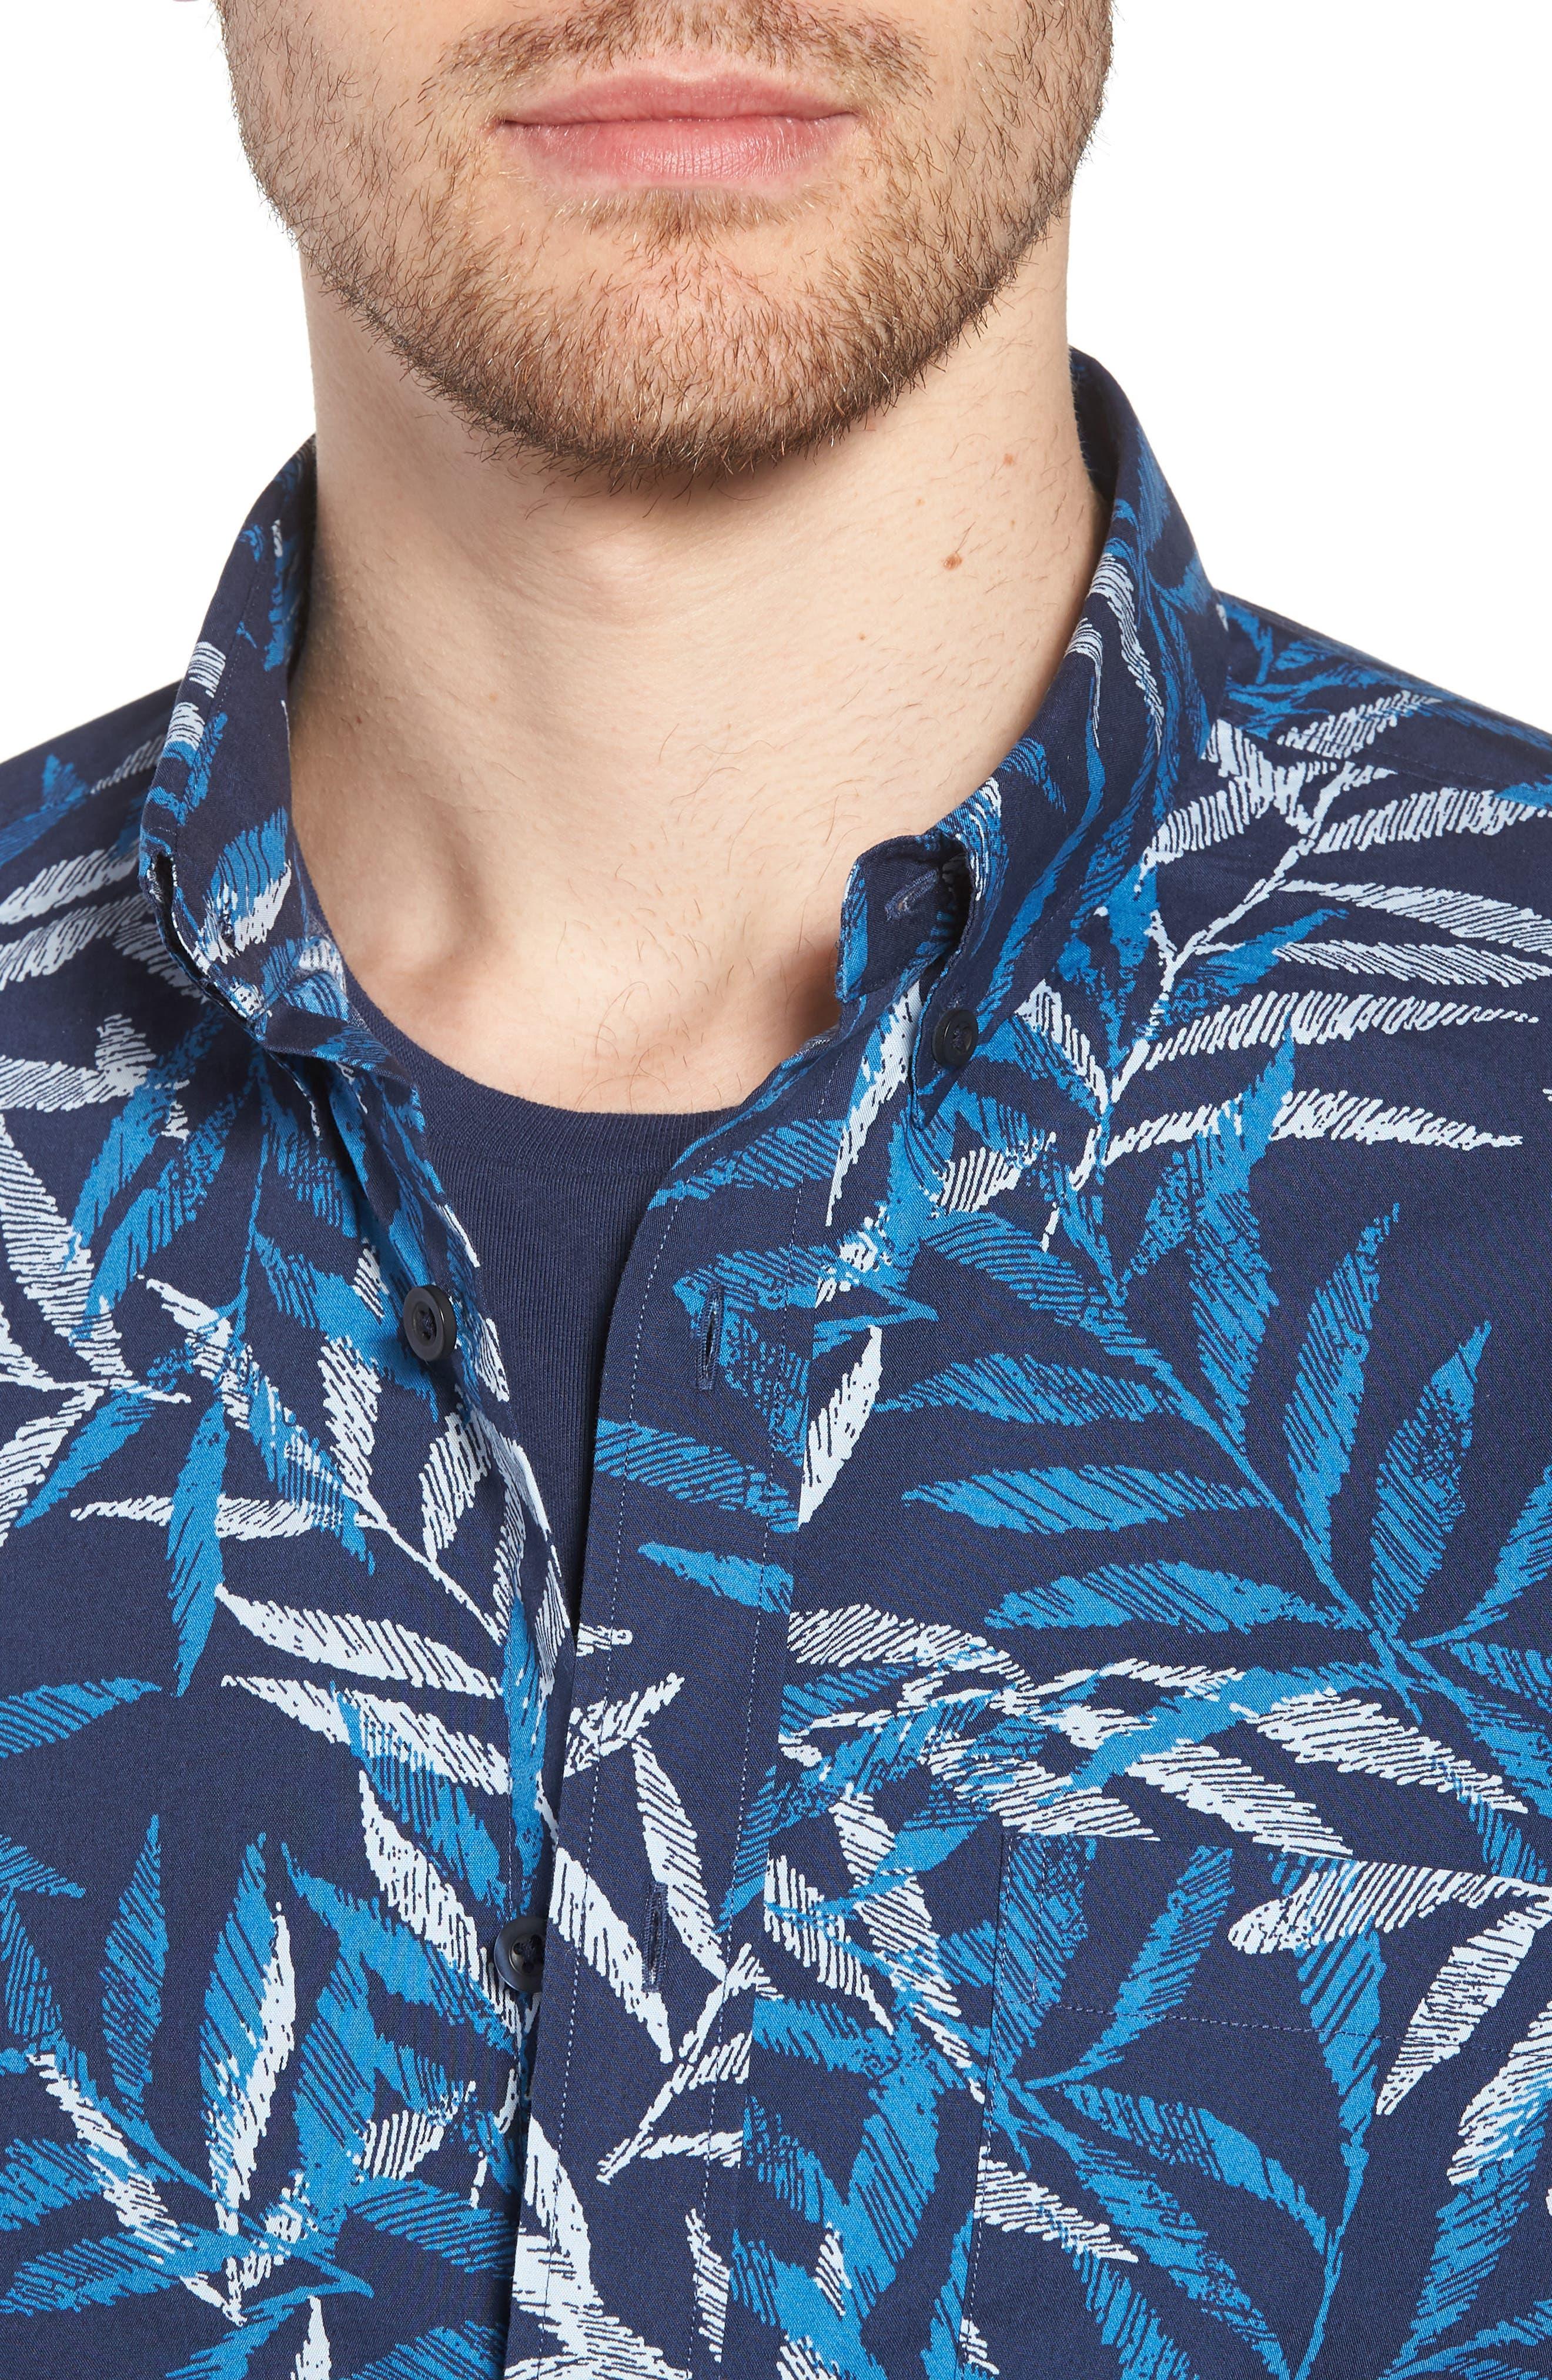 Trim Fit Print Short Sleeve Sport Shirt,                             Alternate thumbnail 4, color,                             Blue Dark Etched Leaves